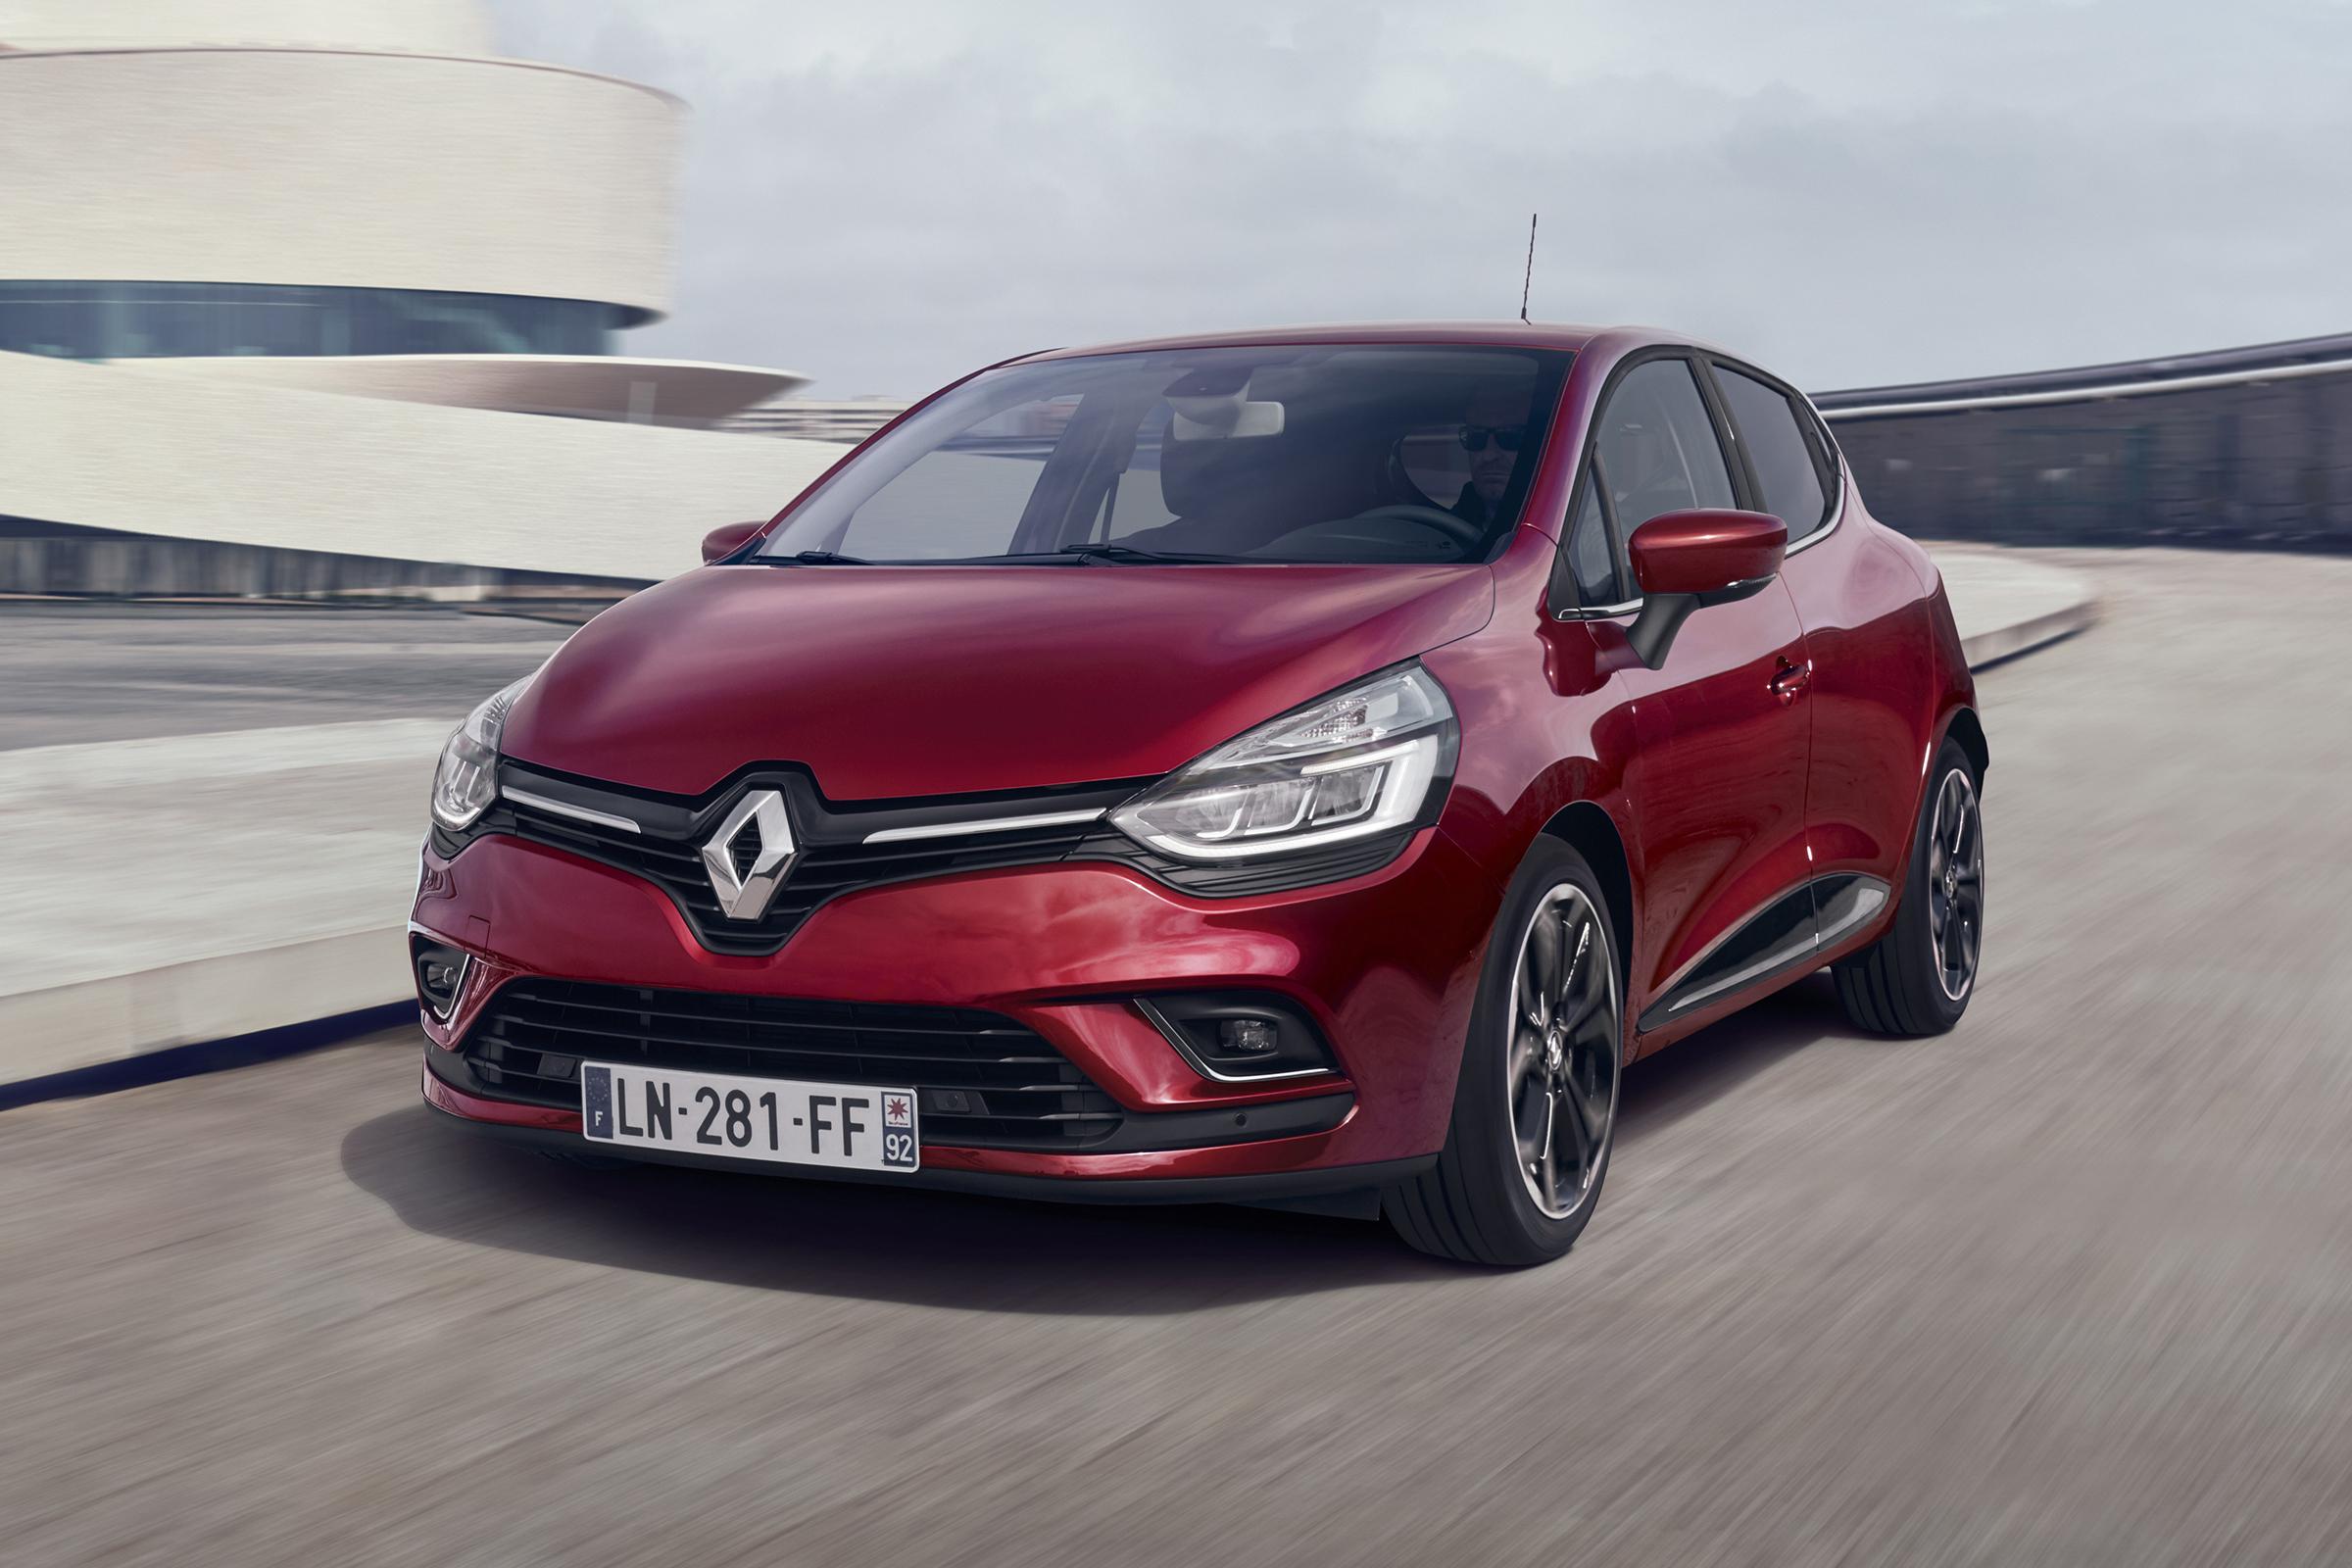 New 2017 Renault Clio Updates Announced Carbuyer